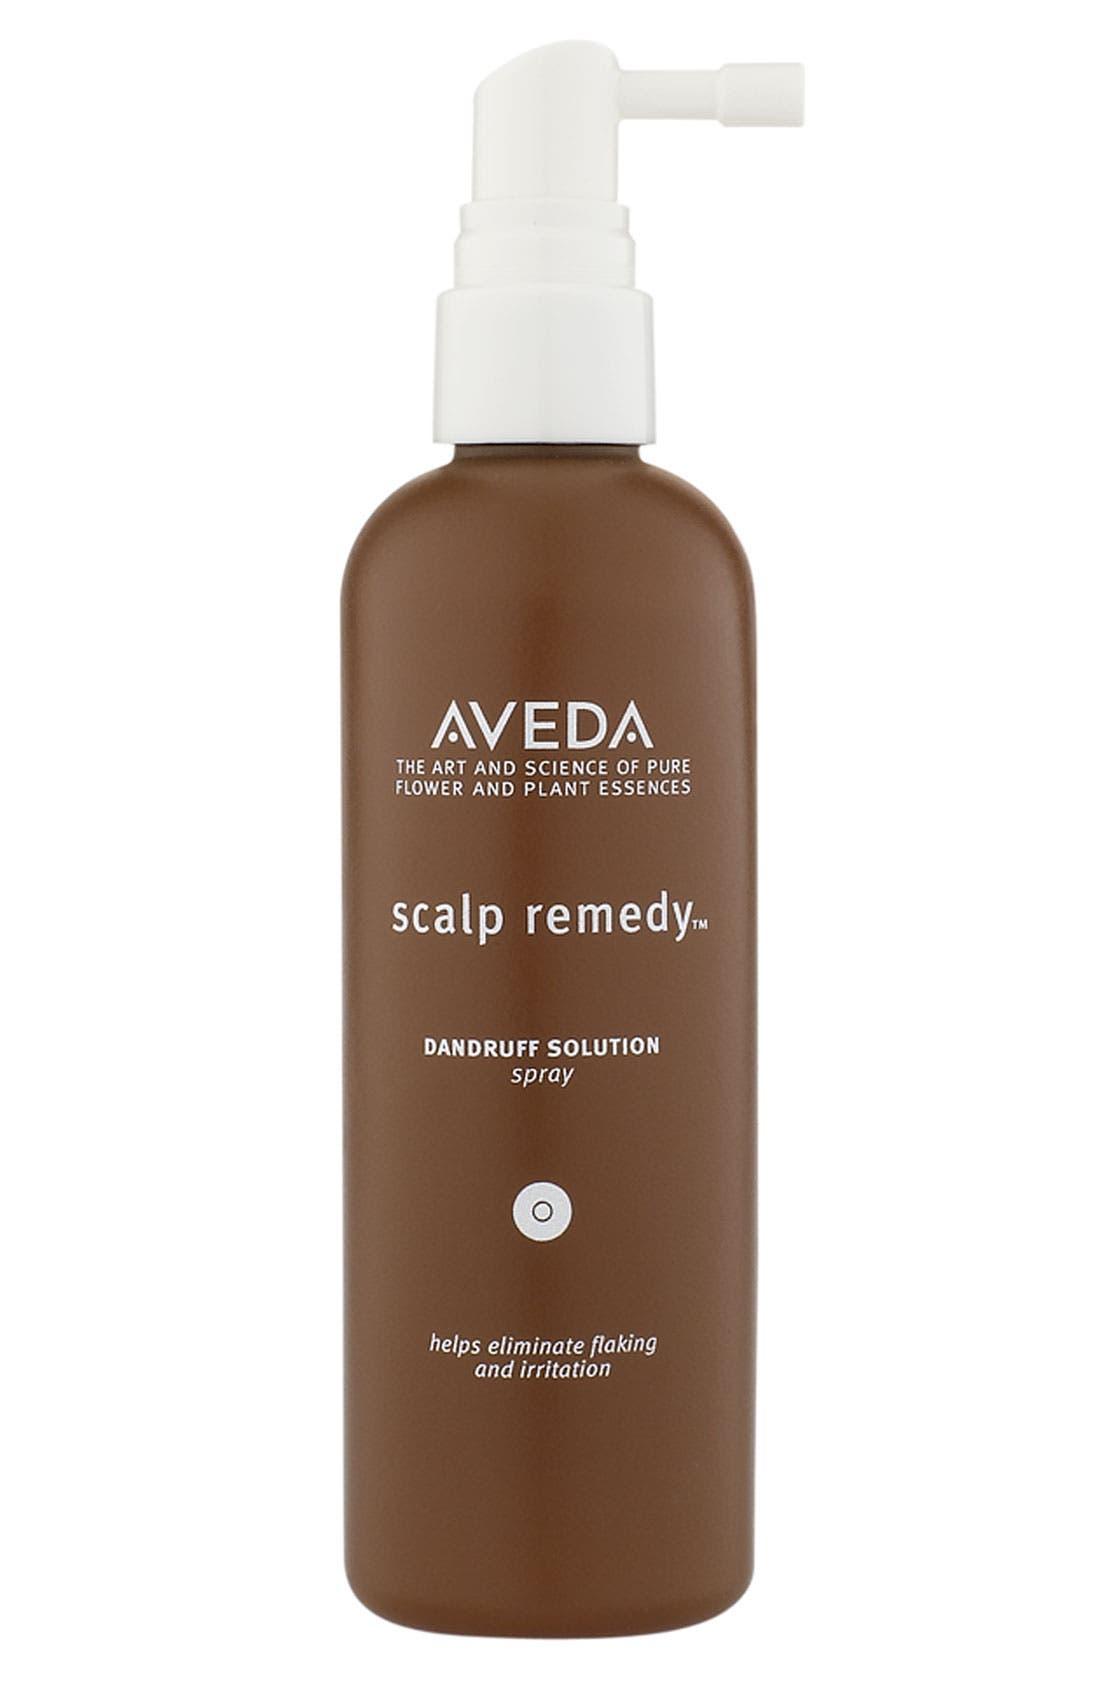 Aveda 'scalp remedy™' Dandruff Solution